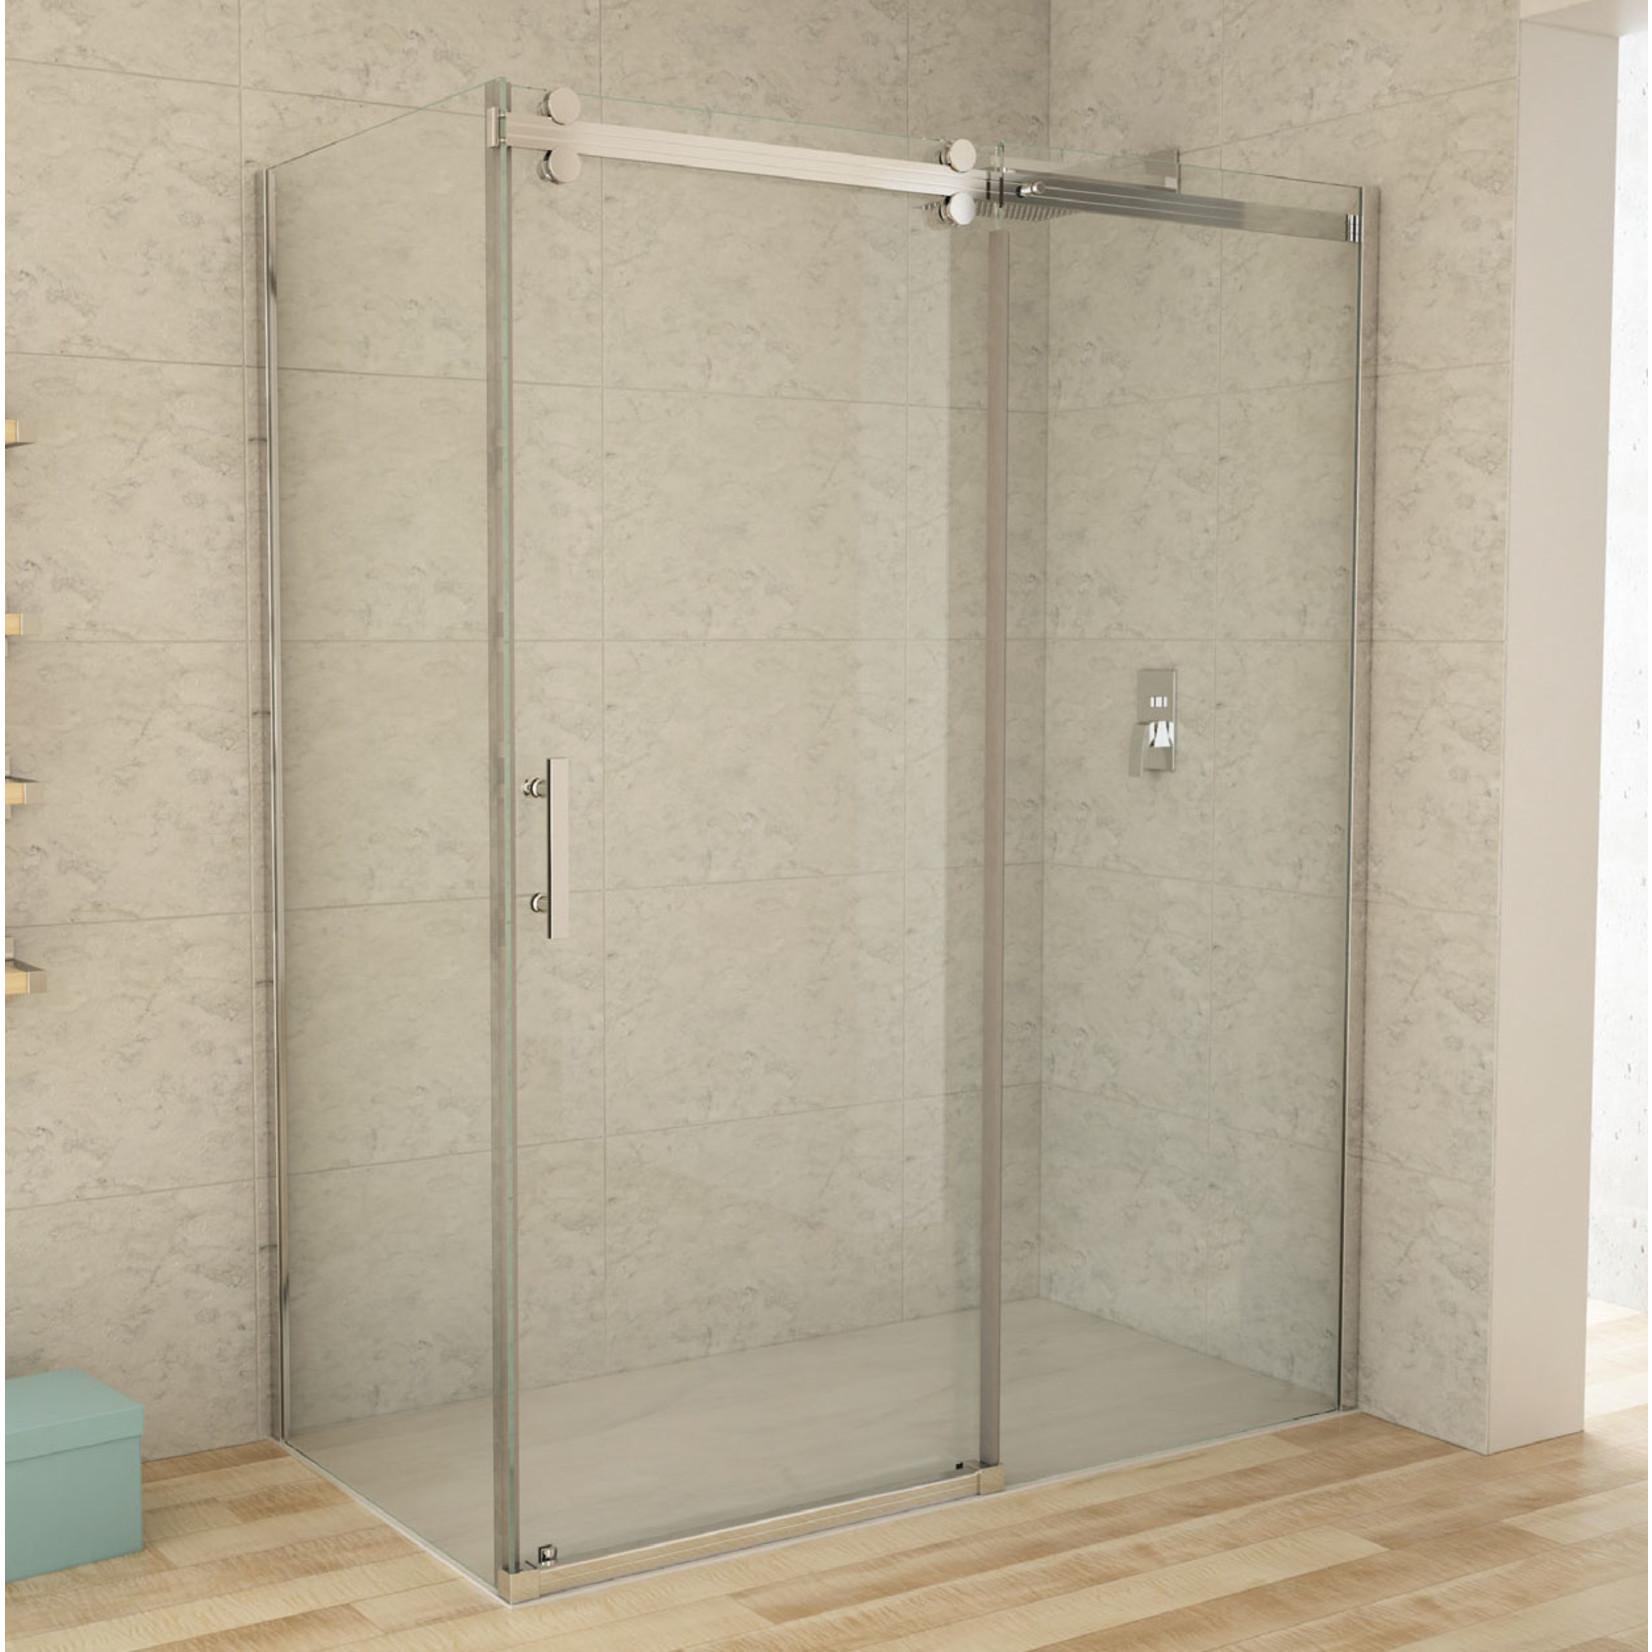 Reversible chrome shower set 32x60 CDC